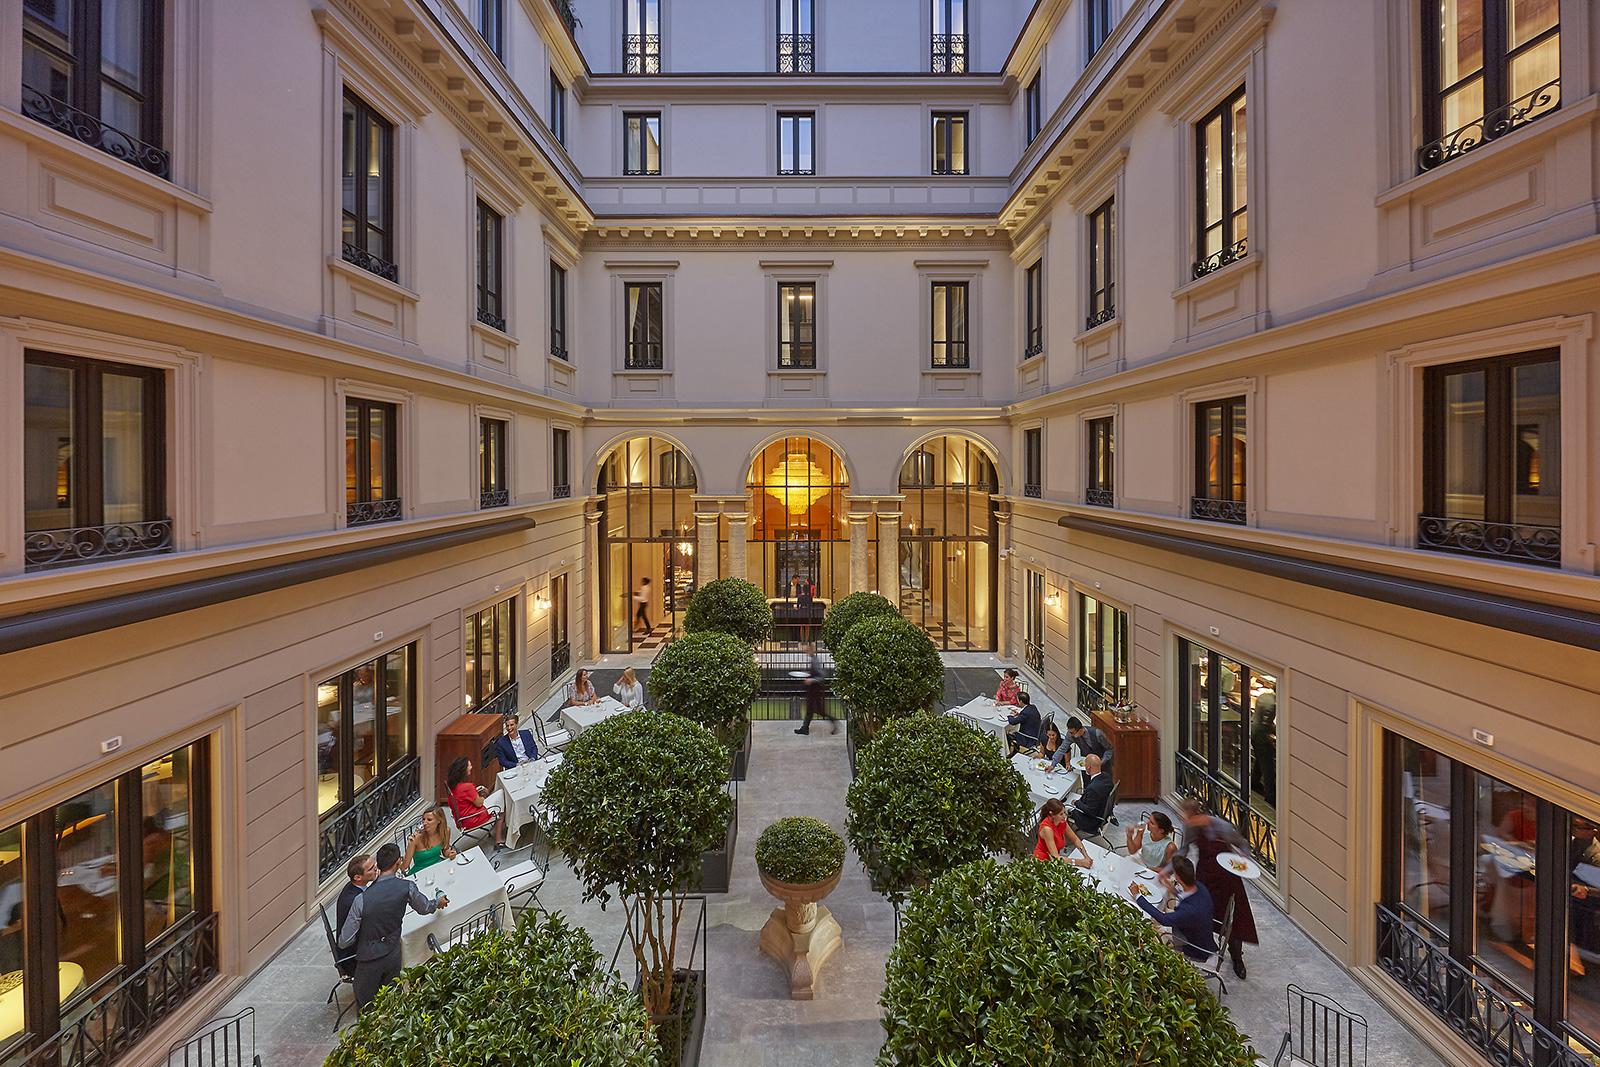 Courtesy of Seta / Mandarin Orient Hotel Milano